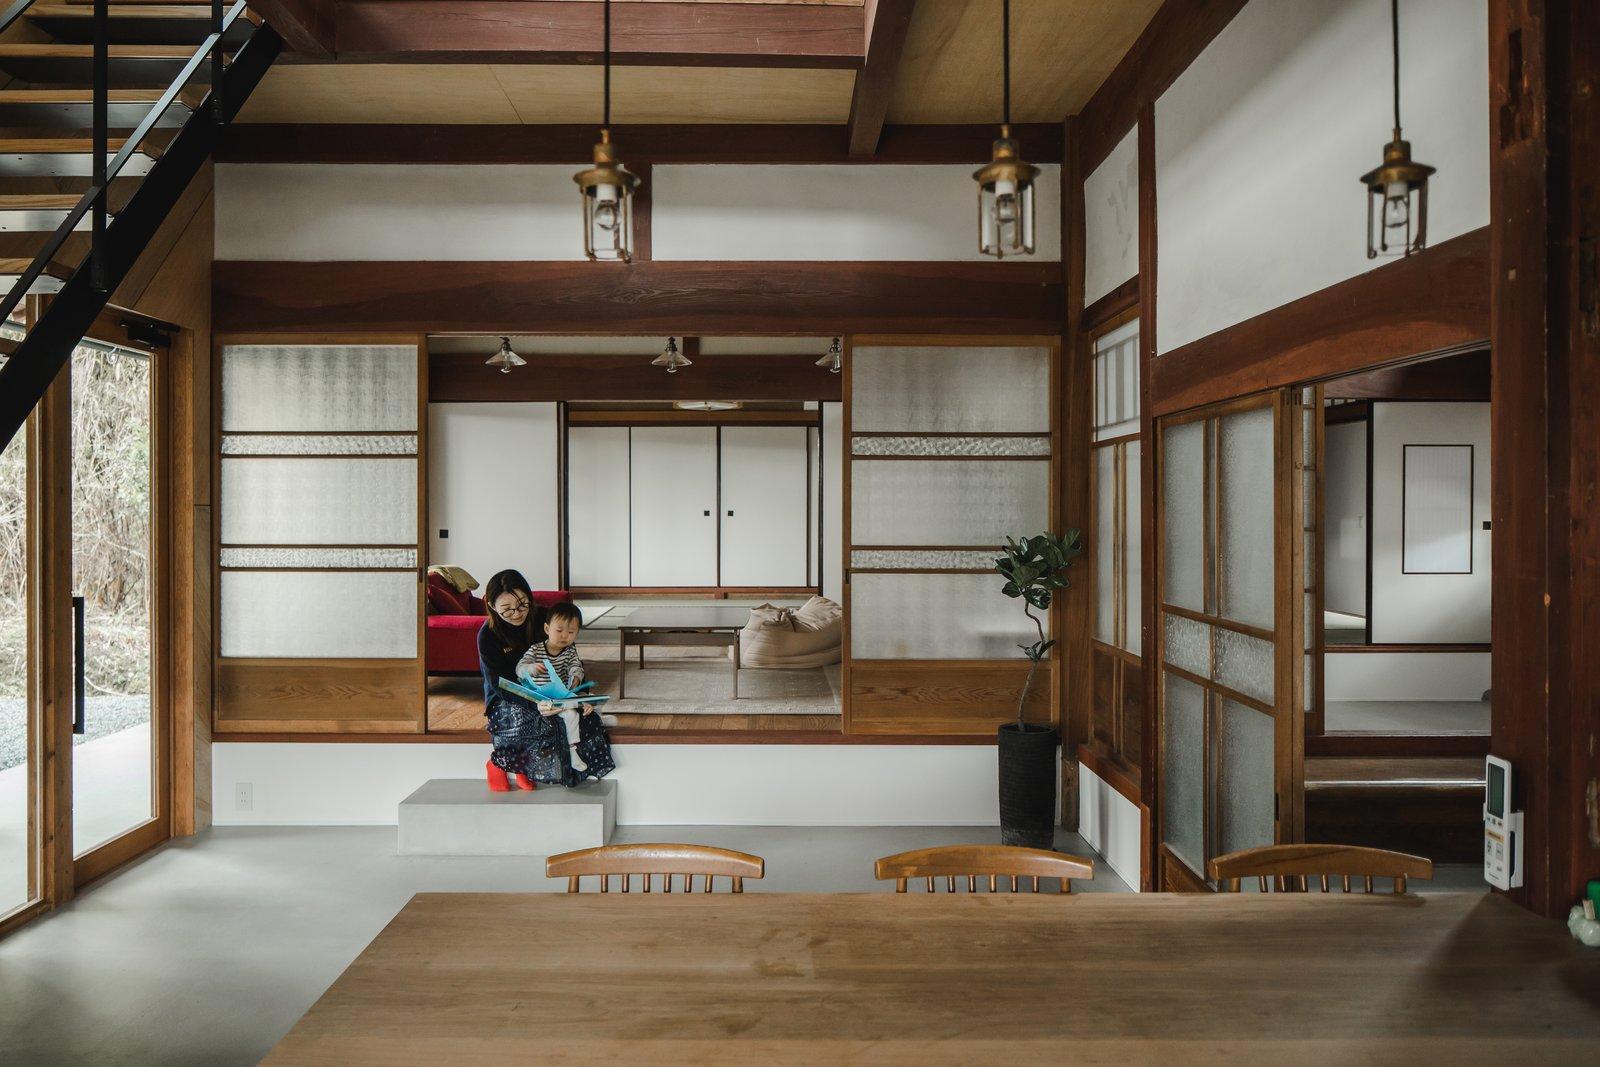 une maison traditionnelle japonaise r nov e lili in. Black Bedroom Furniture Sets. Home Design Ideas